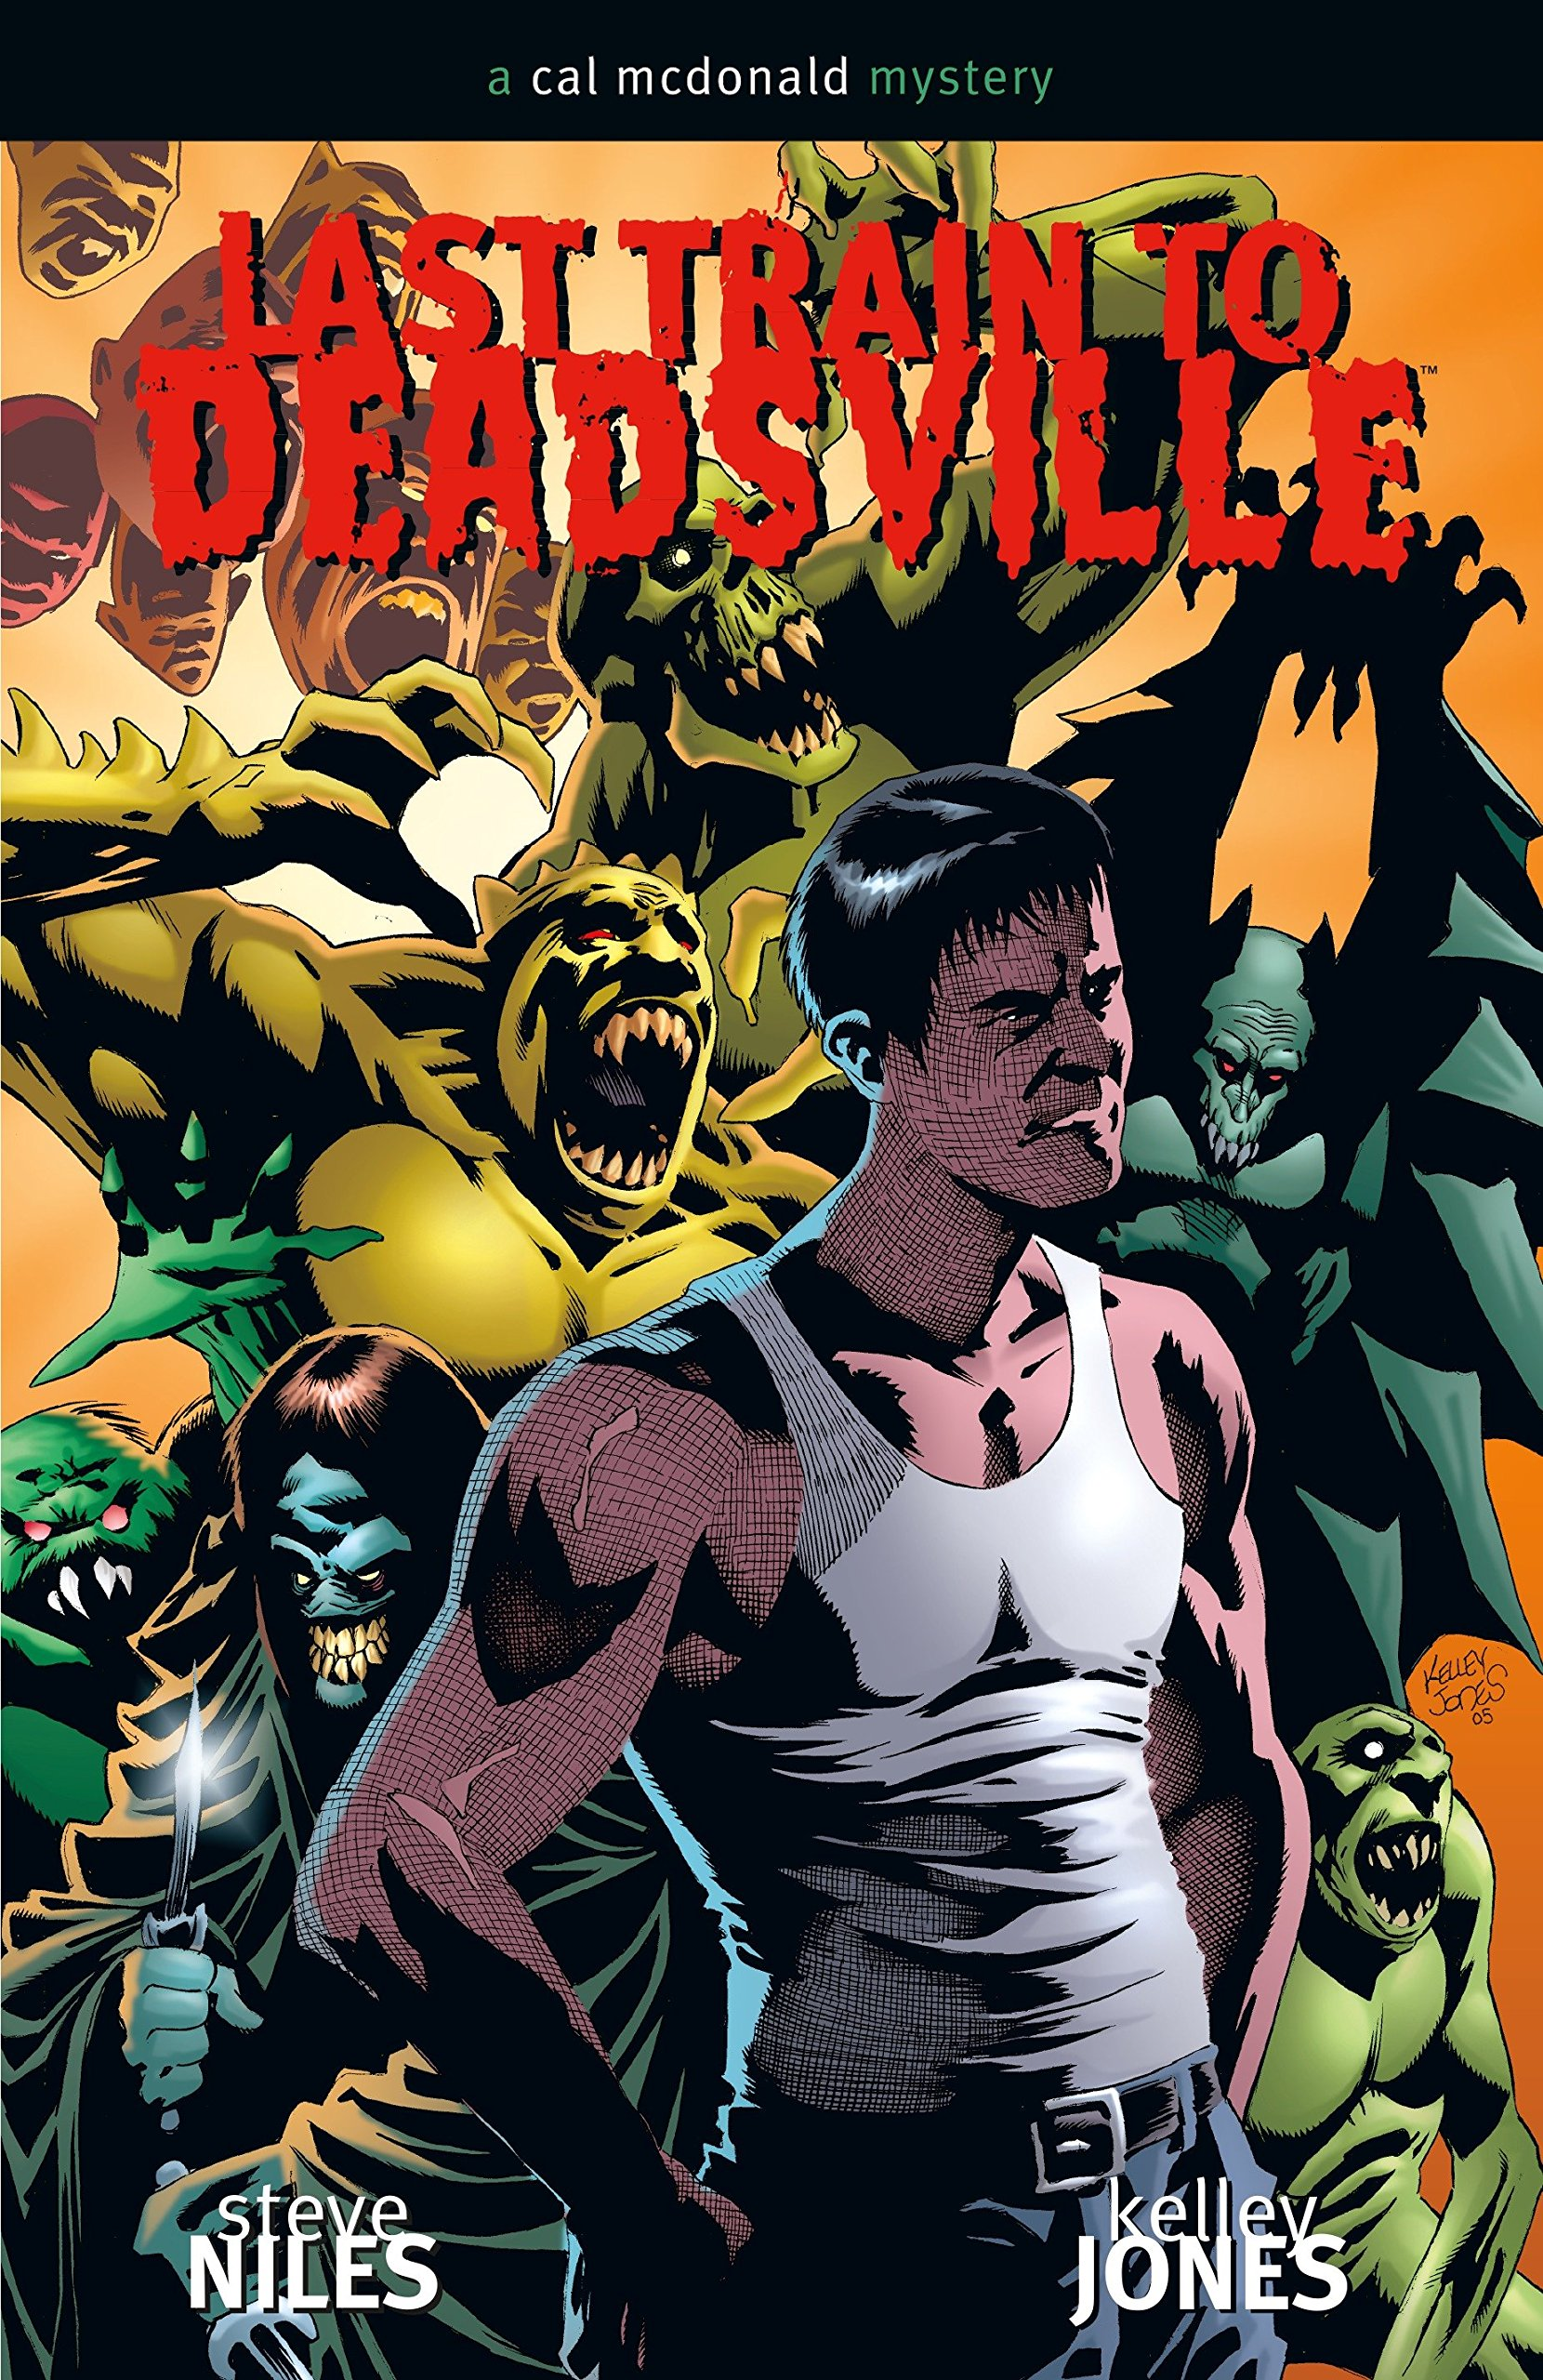 Download Last Train To Deadsville: A Cal McDonald Mystery (Cal McDonald, Monster Hunter) ebook